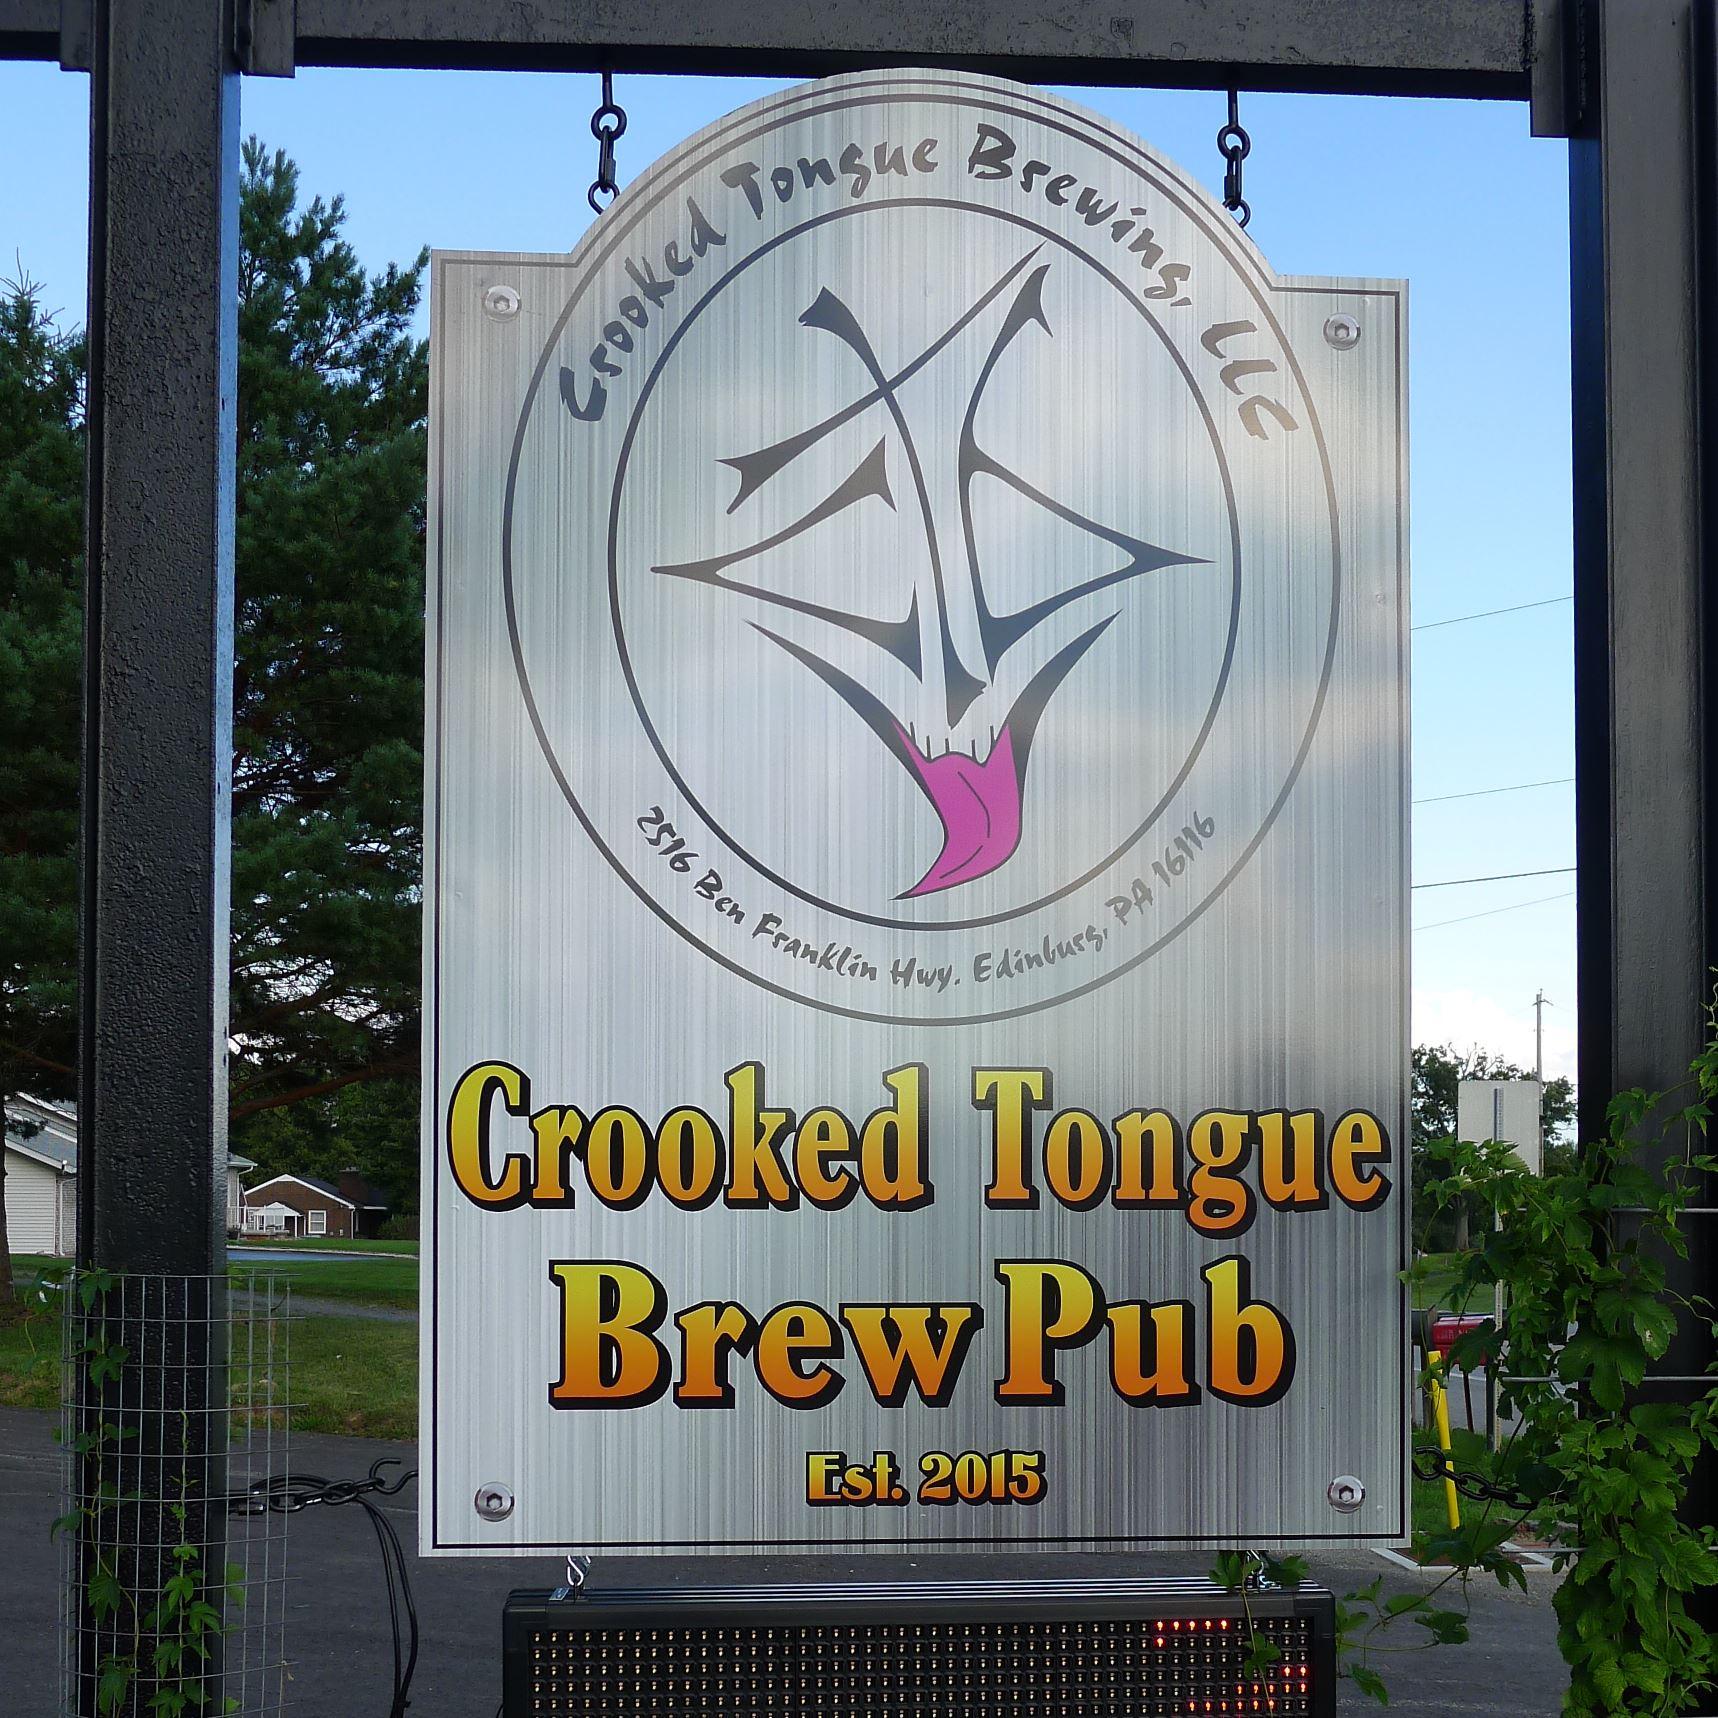 P1250994-8 Crooked Tongue Brewing in Edinburg, PA.